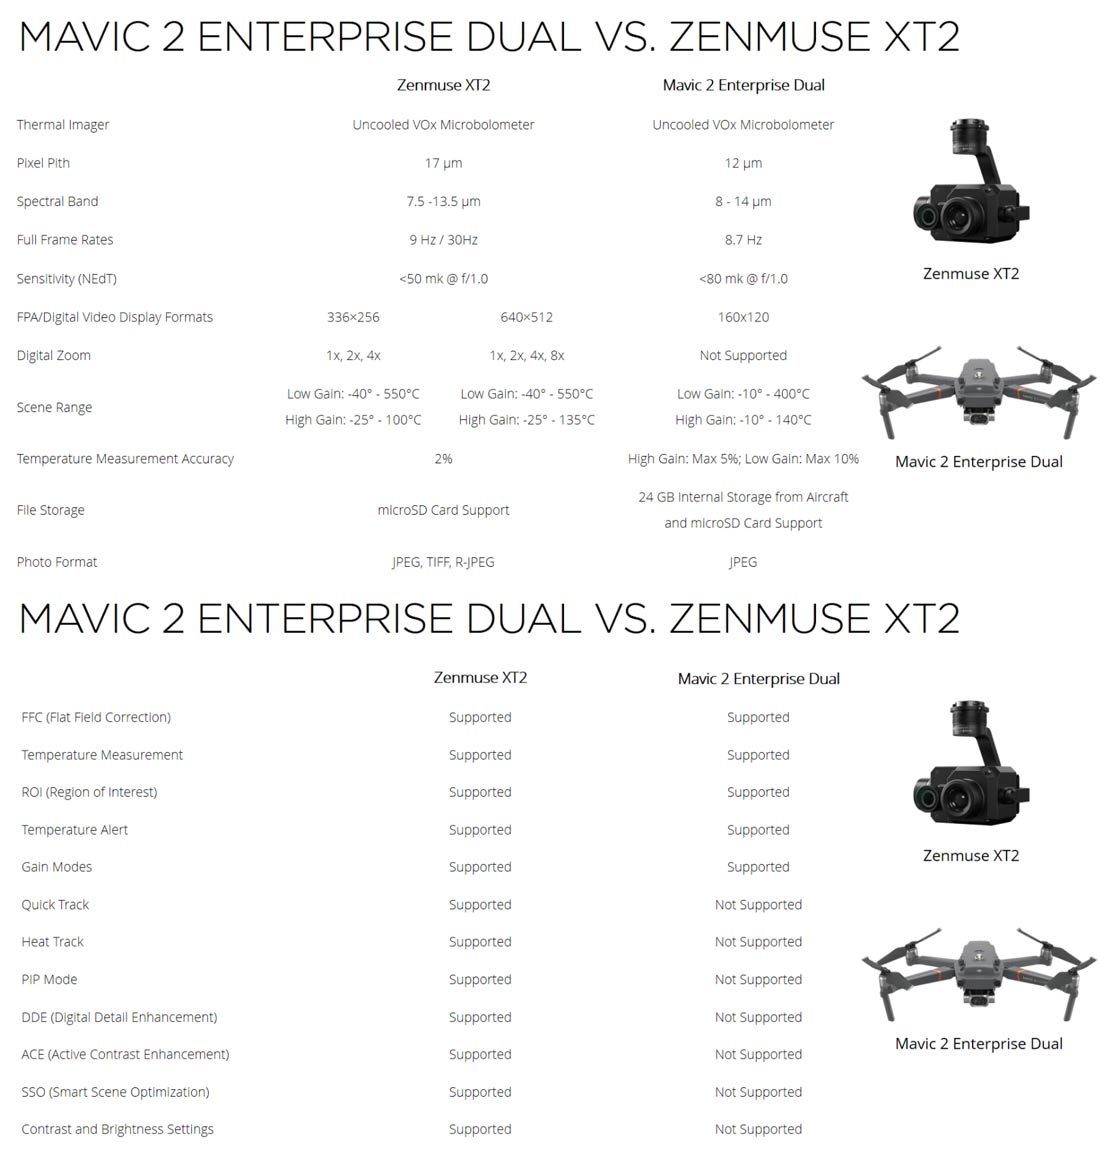 Mavic 2 Enterprise Dual with Enterprise Shield Basic 15